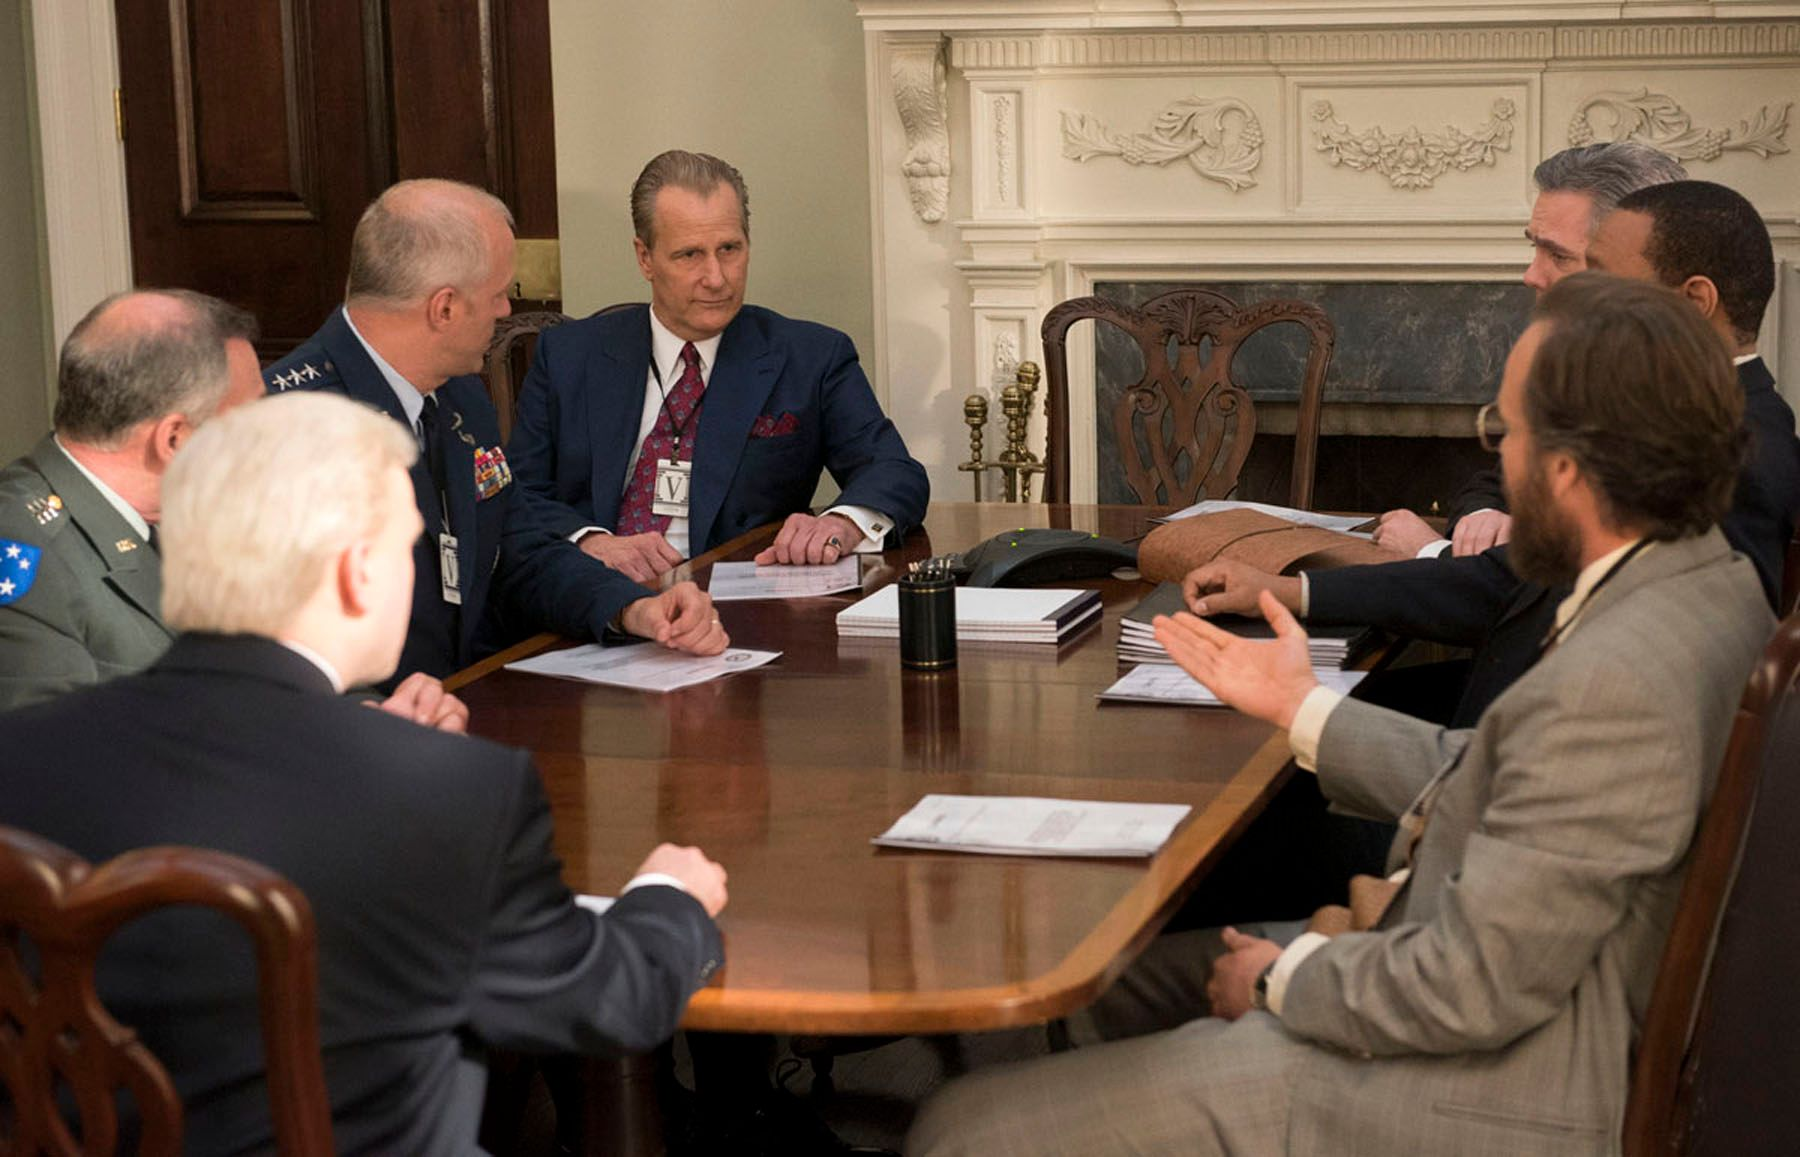 Hulu's 'The Looming Tower' looks at pre-9/11 intelligence turf wars